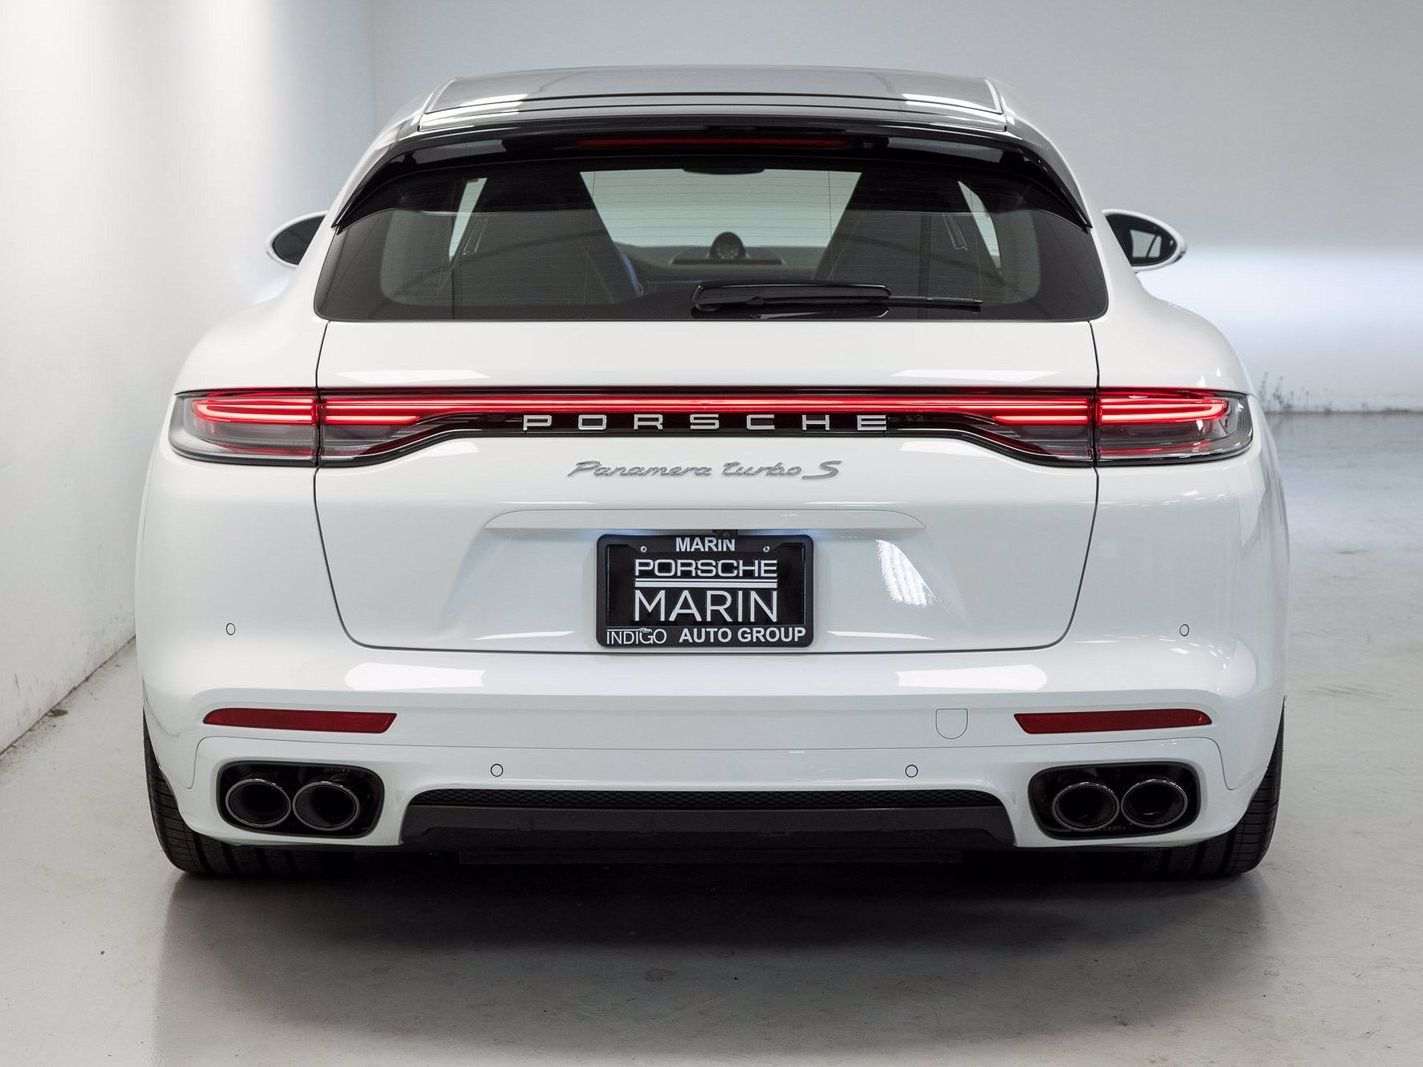 2021 Porsche Panamera Turbo S Sport Turismo – 5